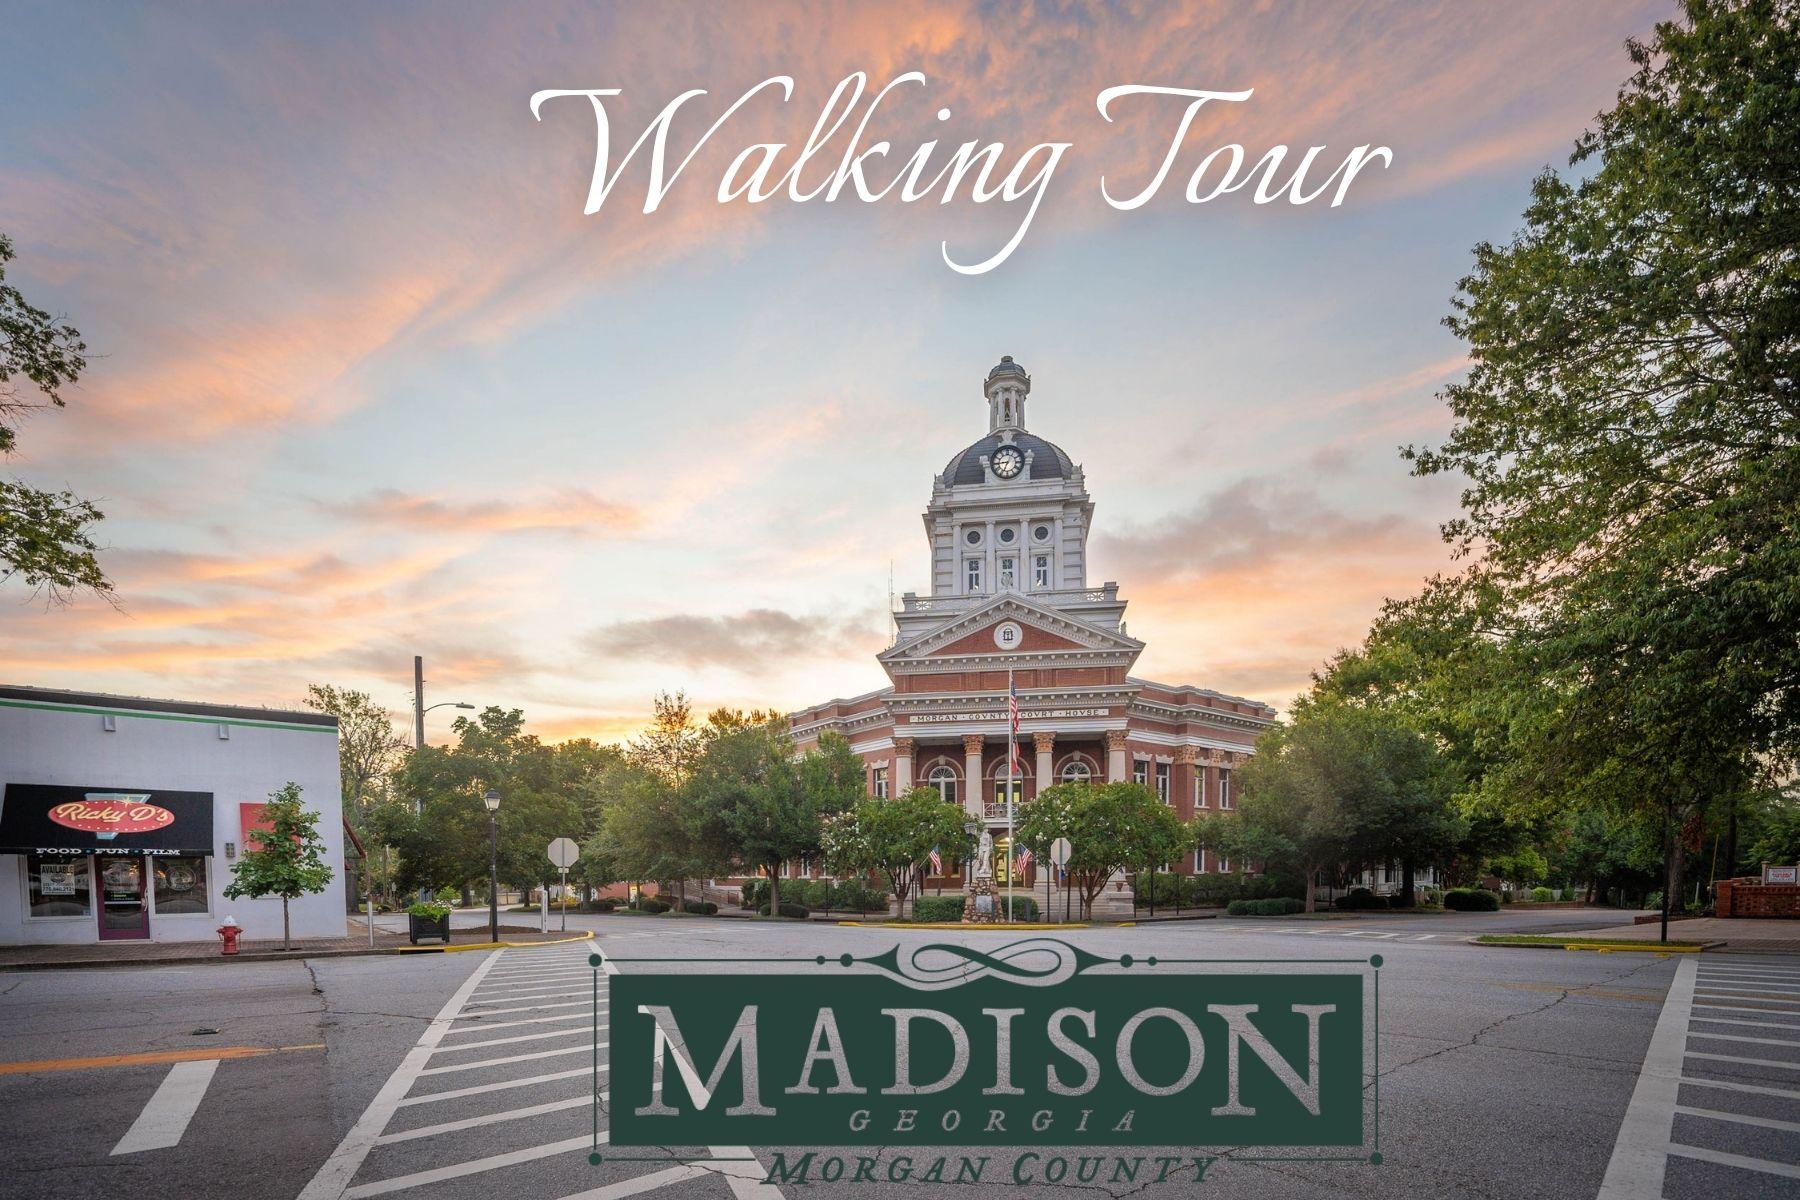 Walking Tour Lead Image